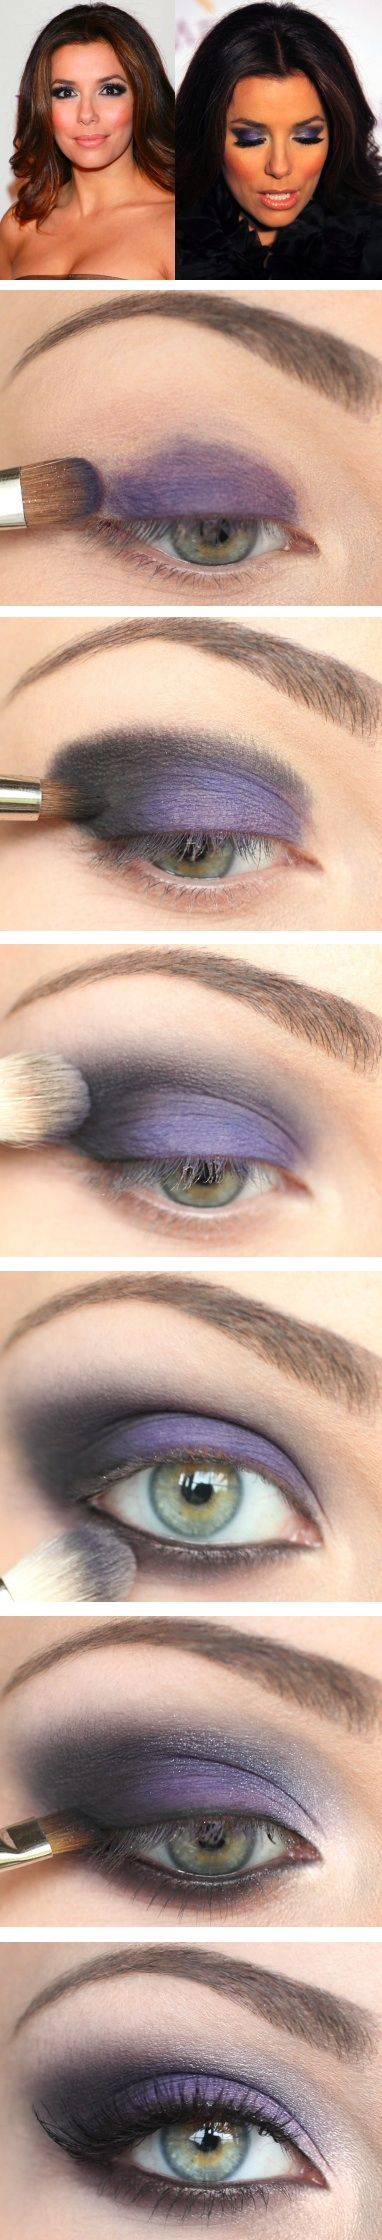 Eva Longoria inspired look.... violets purples smokey